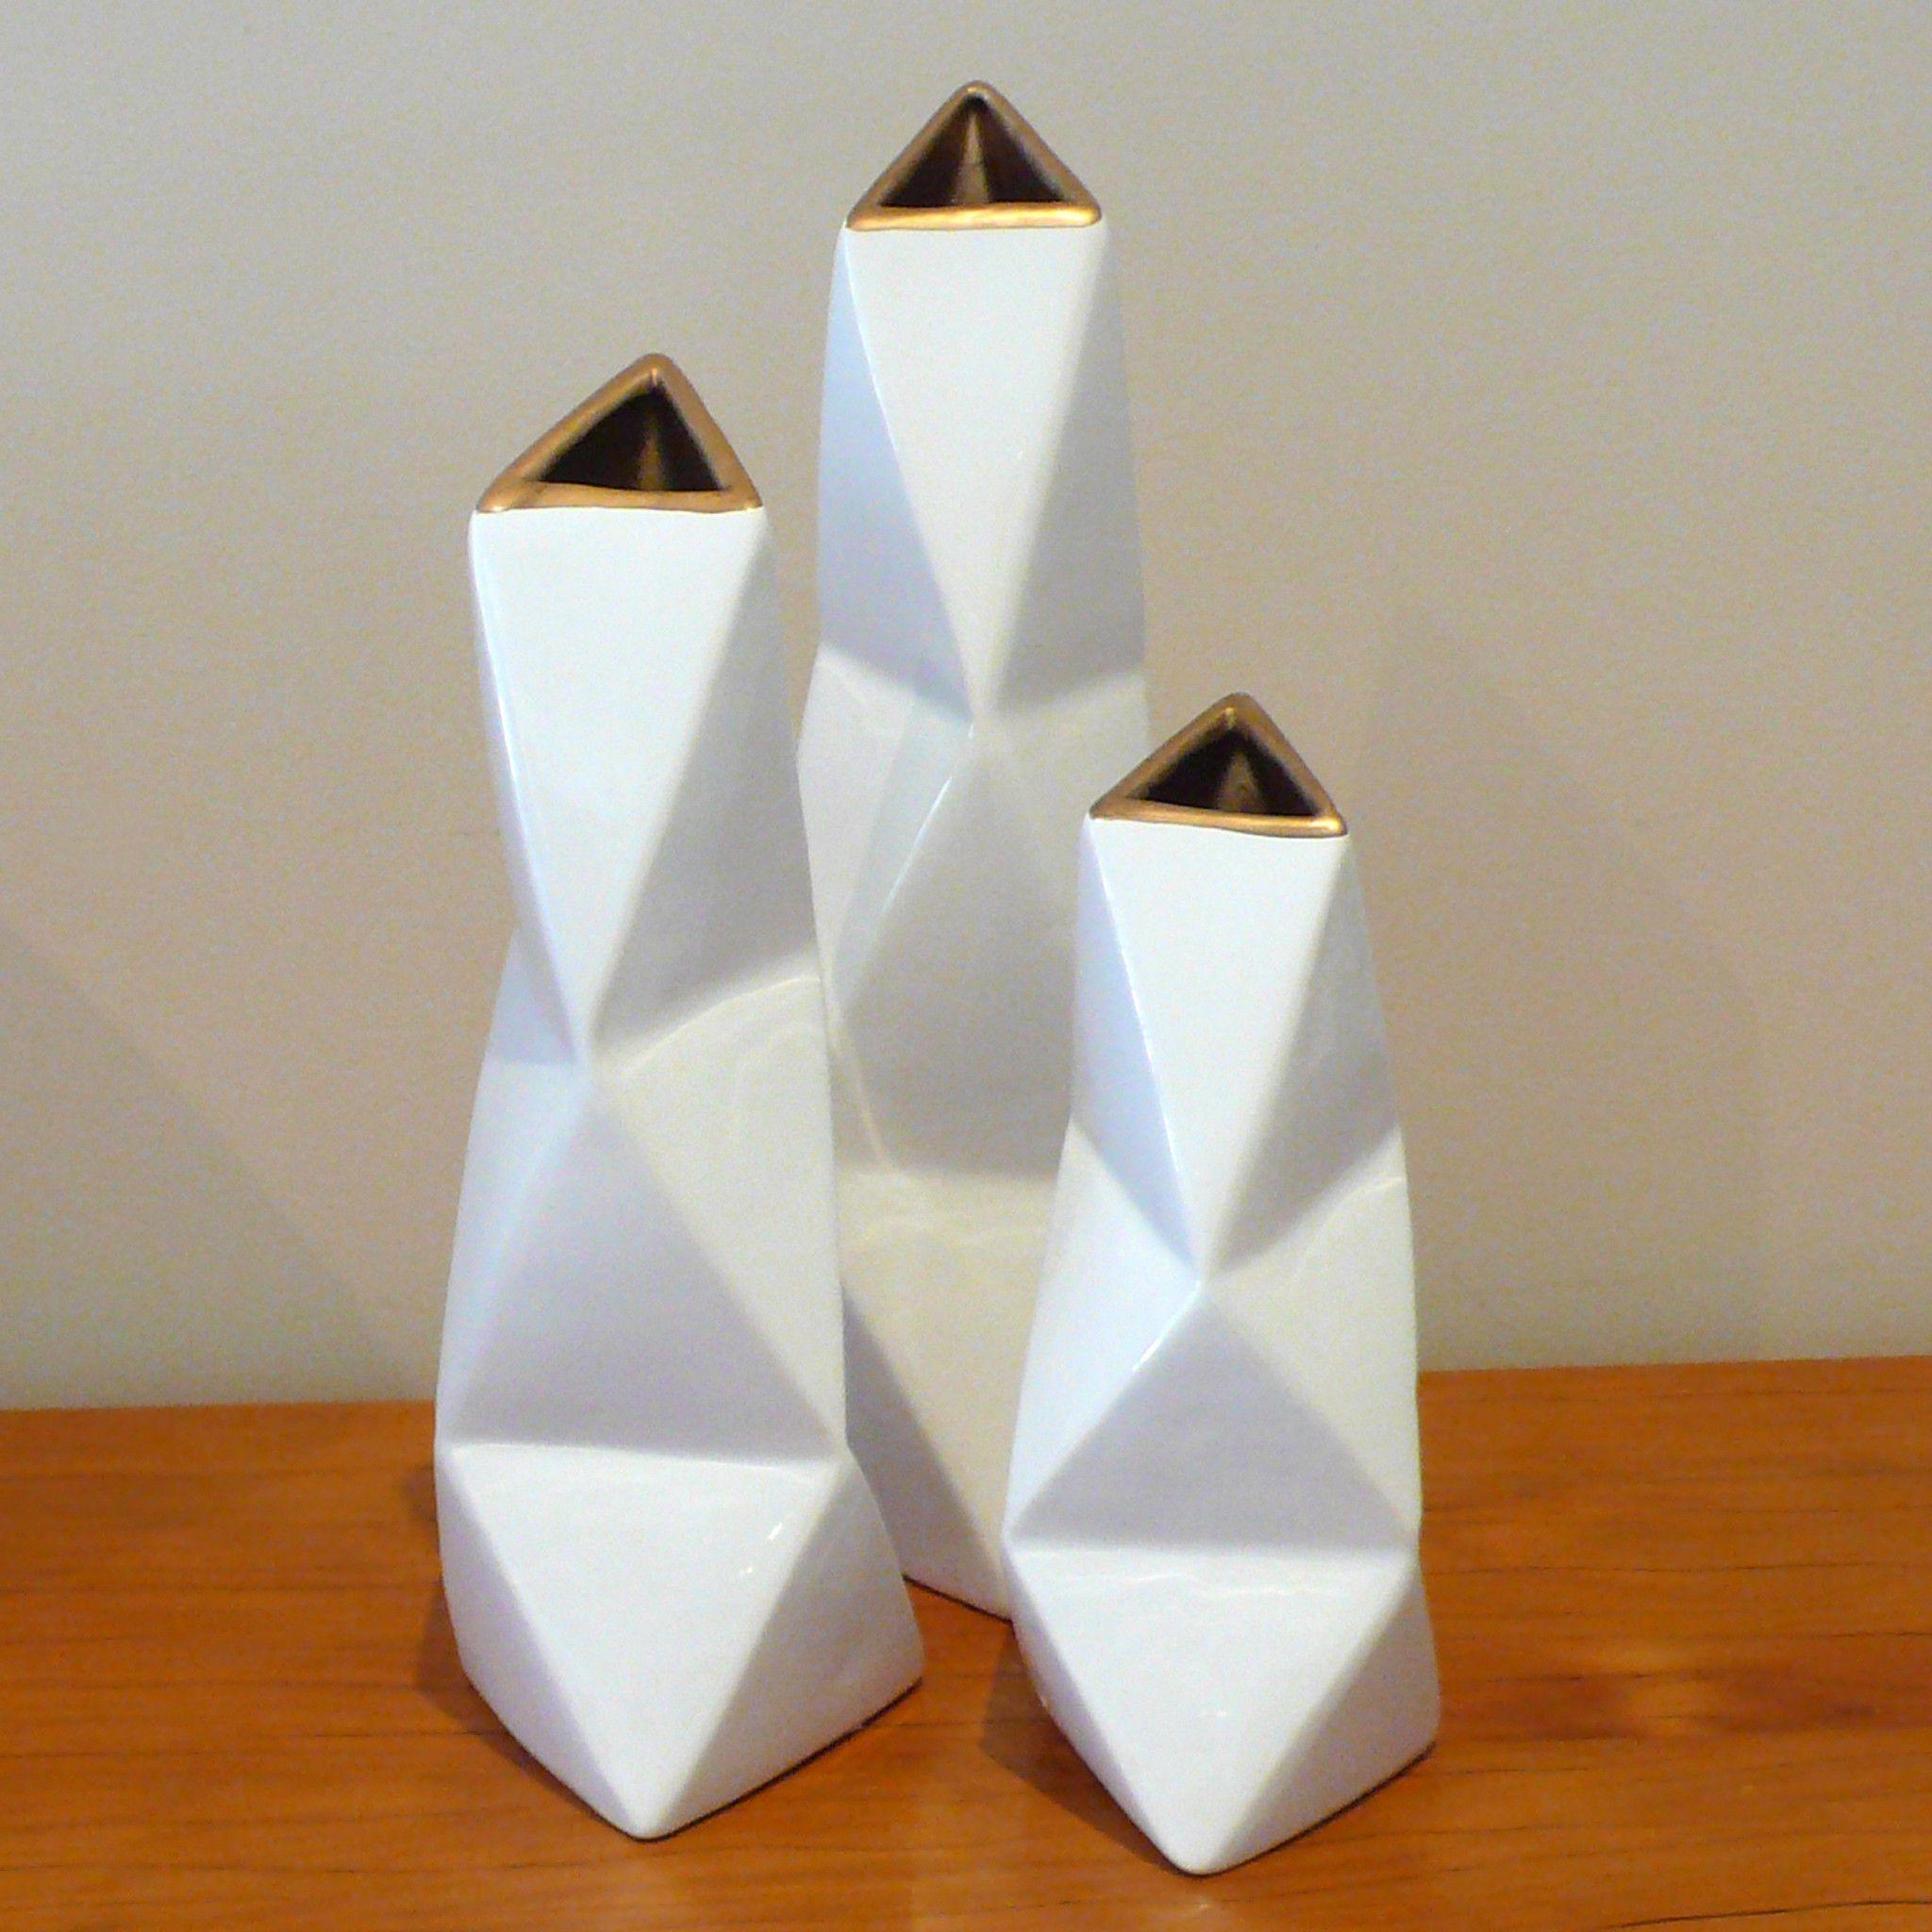 50 elegant vase shapes home idea interesting geometric shapes create an on trend striking reviewsmspy